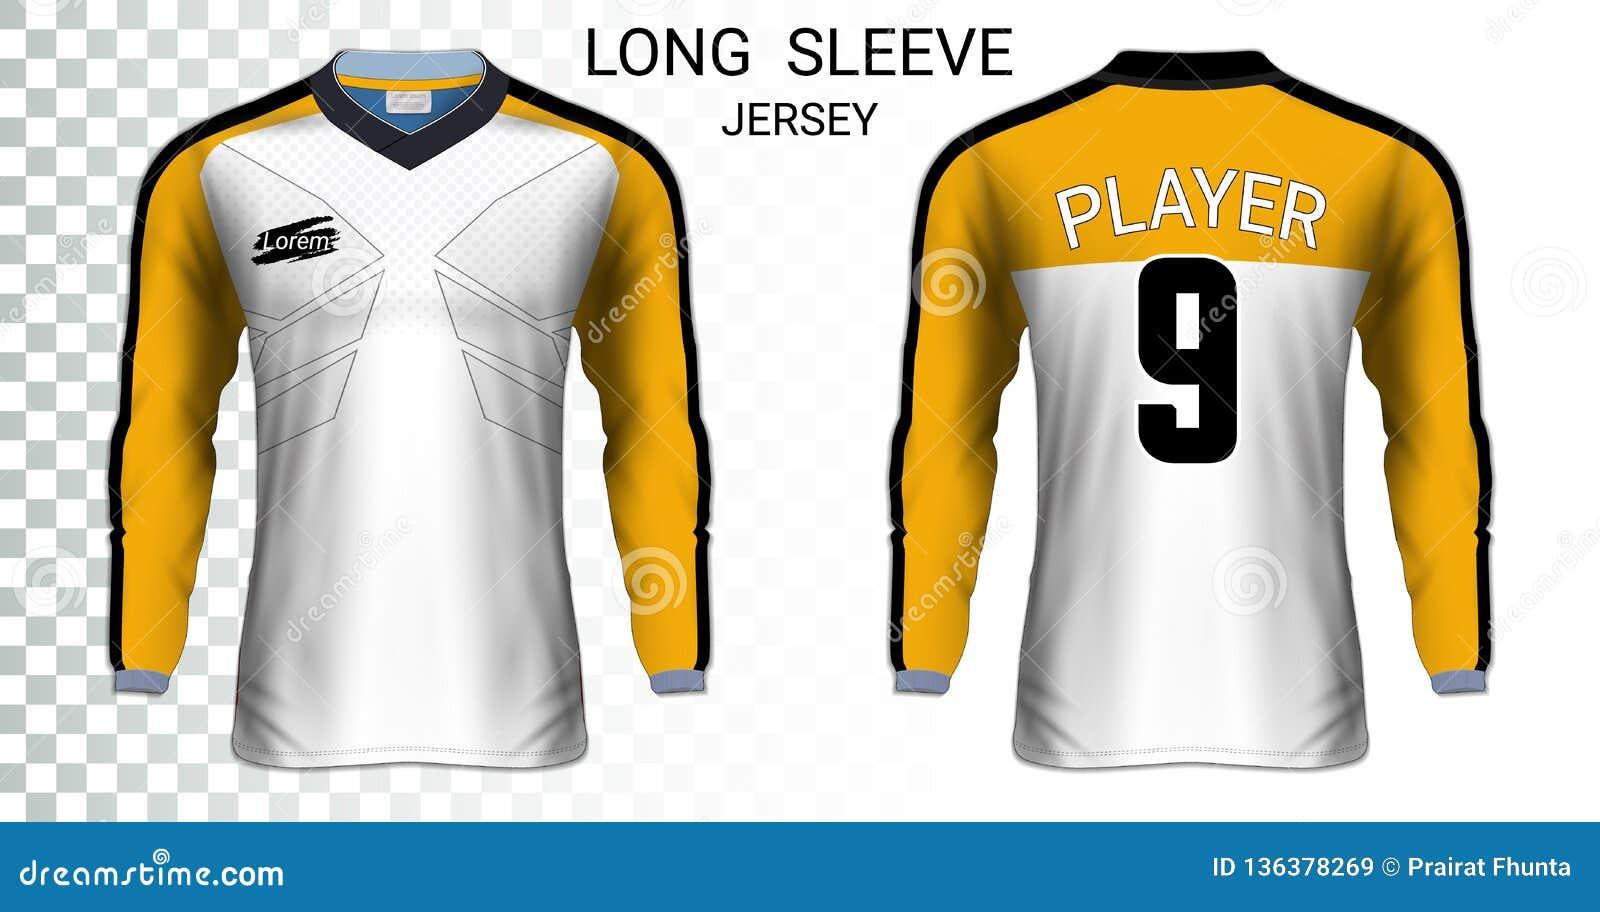 size 40 39ab2 e36f8 Long Sleeve Soccer Jerseys T-shirts Mockup Template. Stock ...